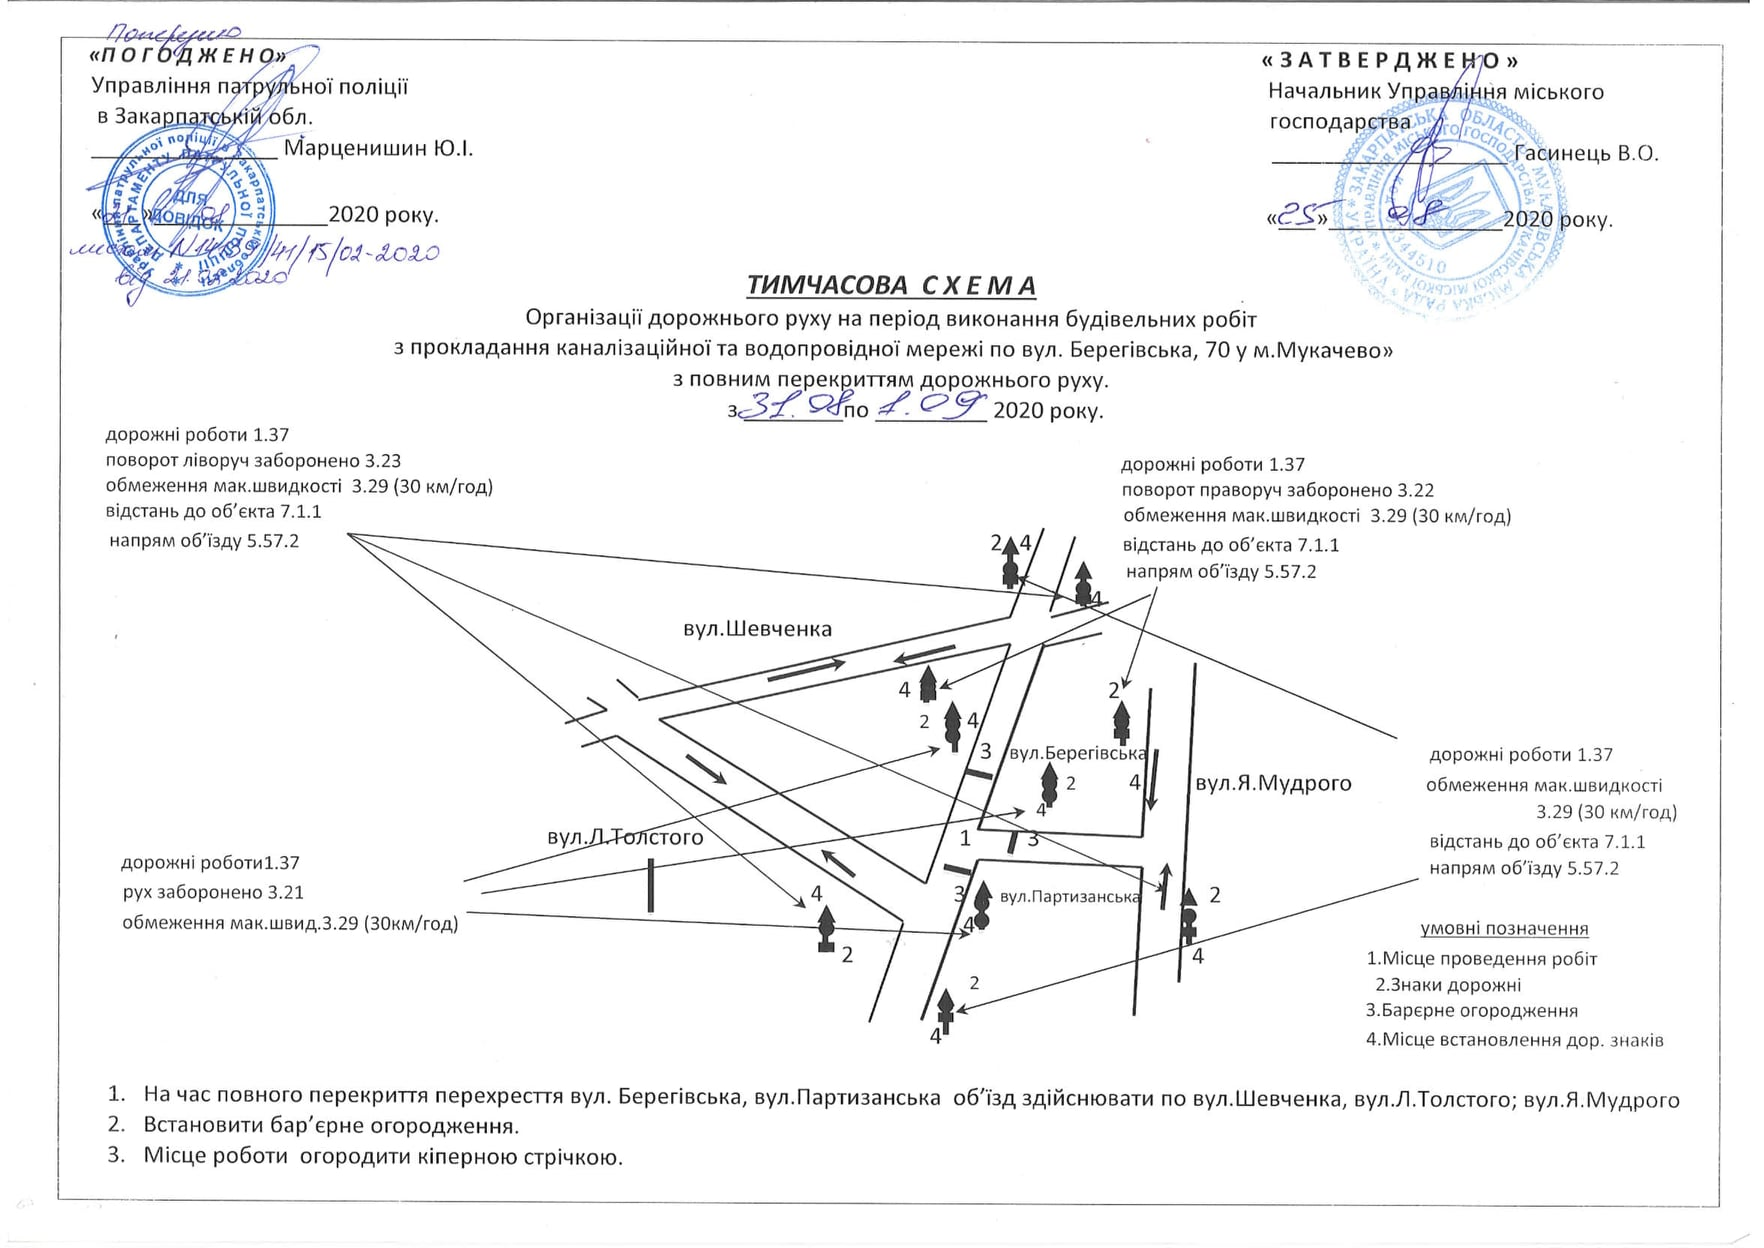 Через ремонт перекриють одну із вулиць Мукачева: схема об'їзду